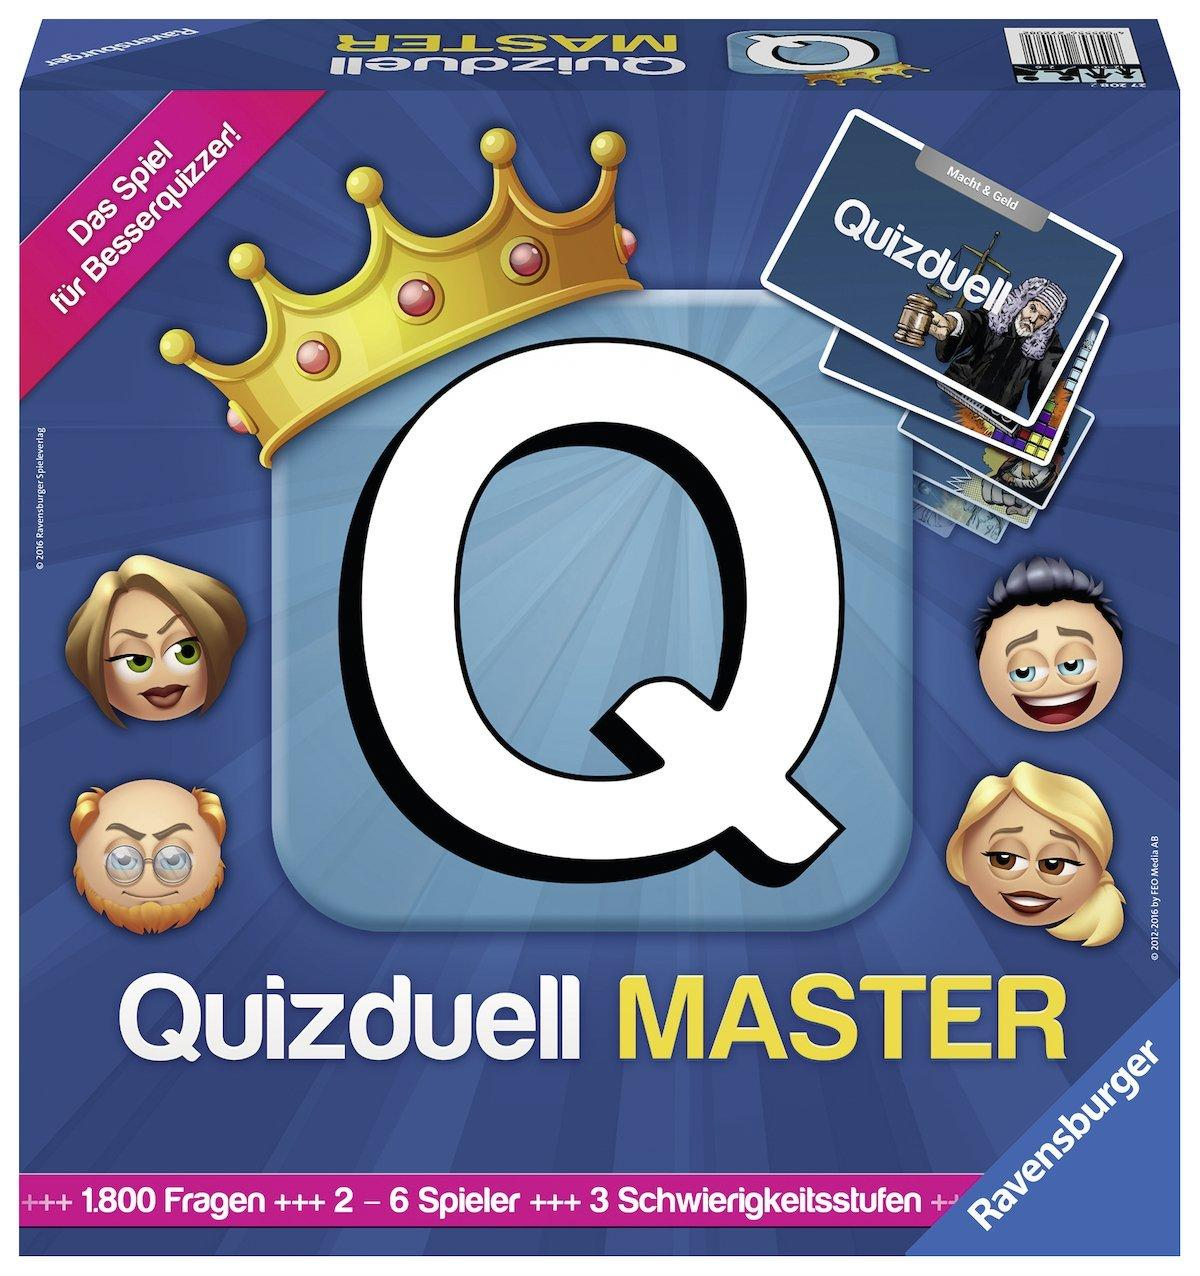 Настольная игра Мастер Quizduell - Ravensburger 27208